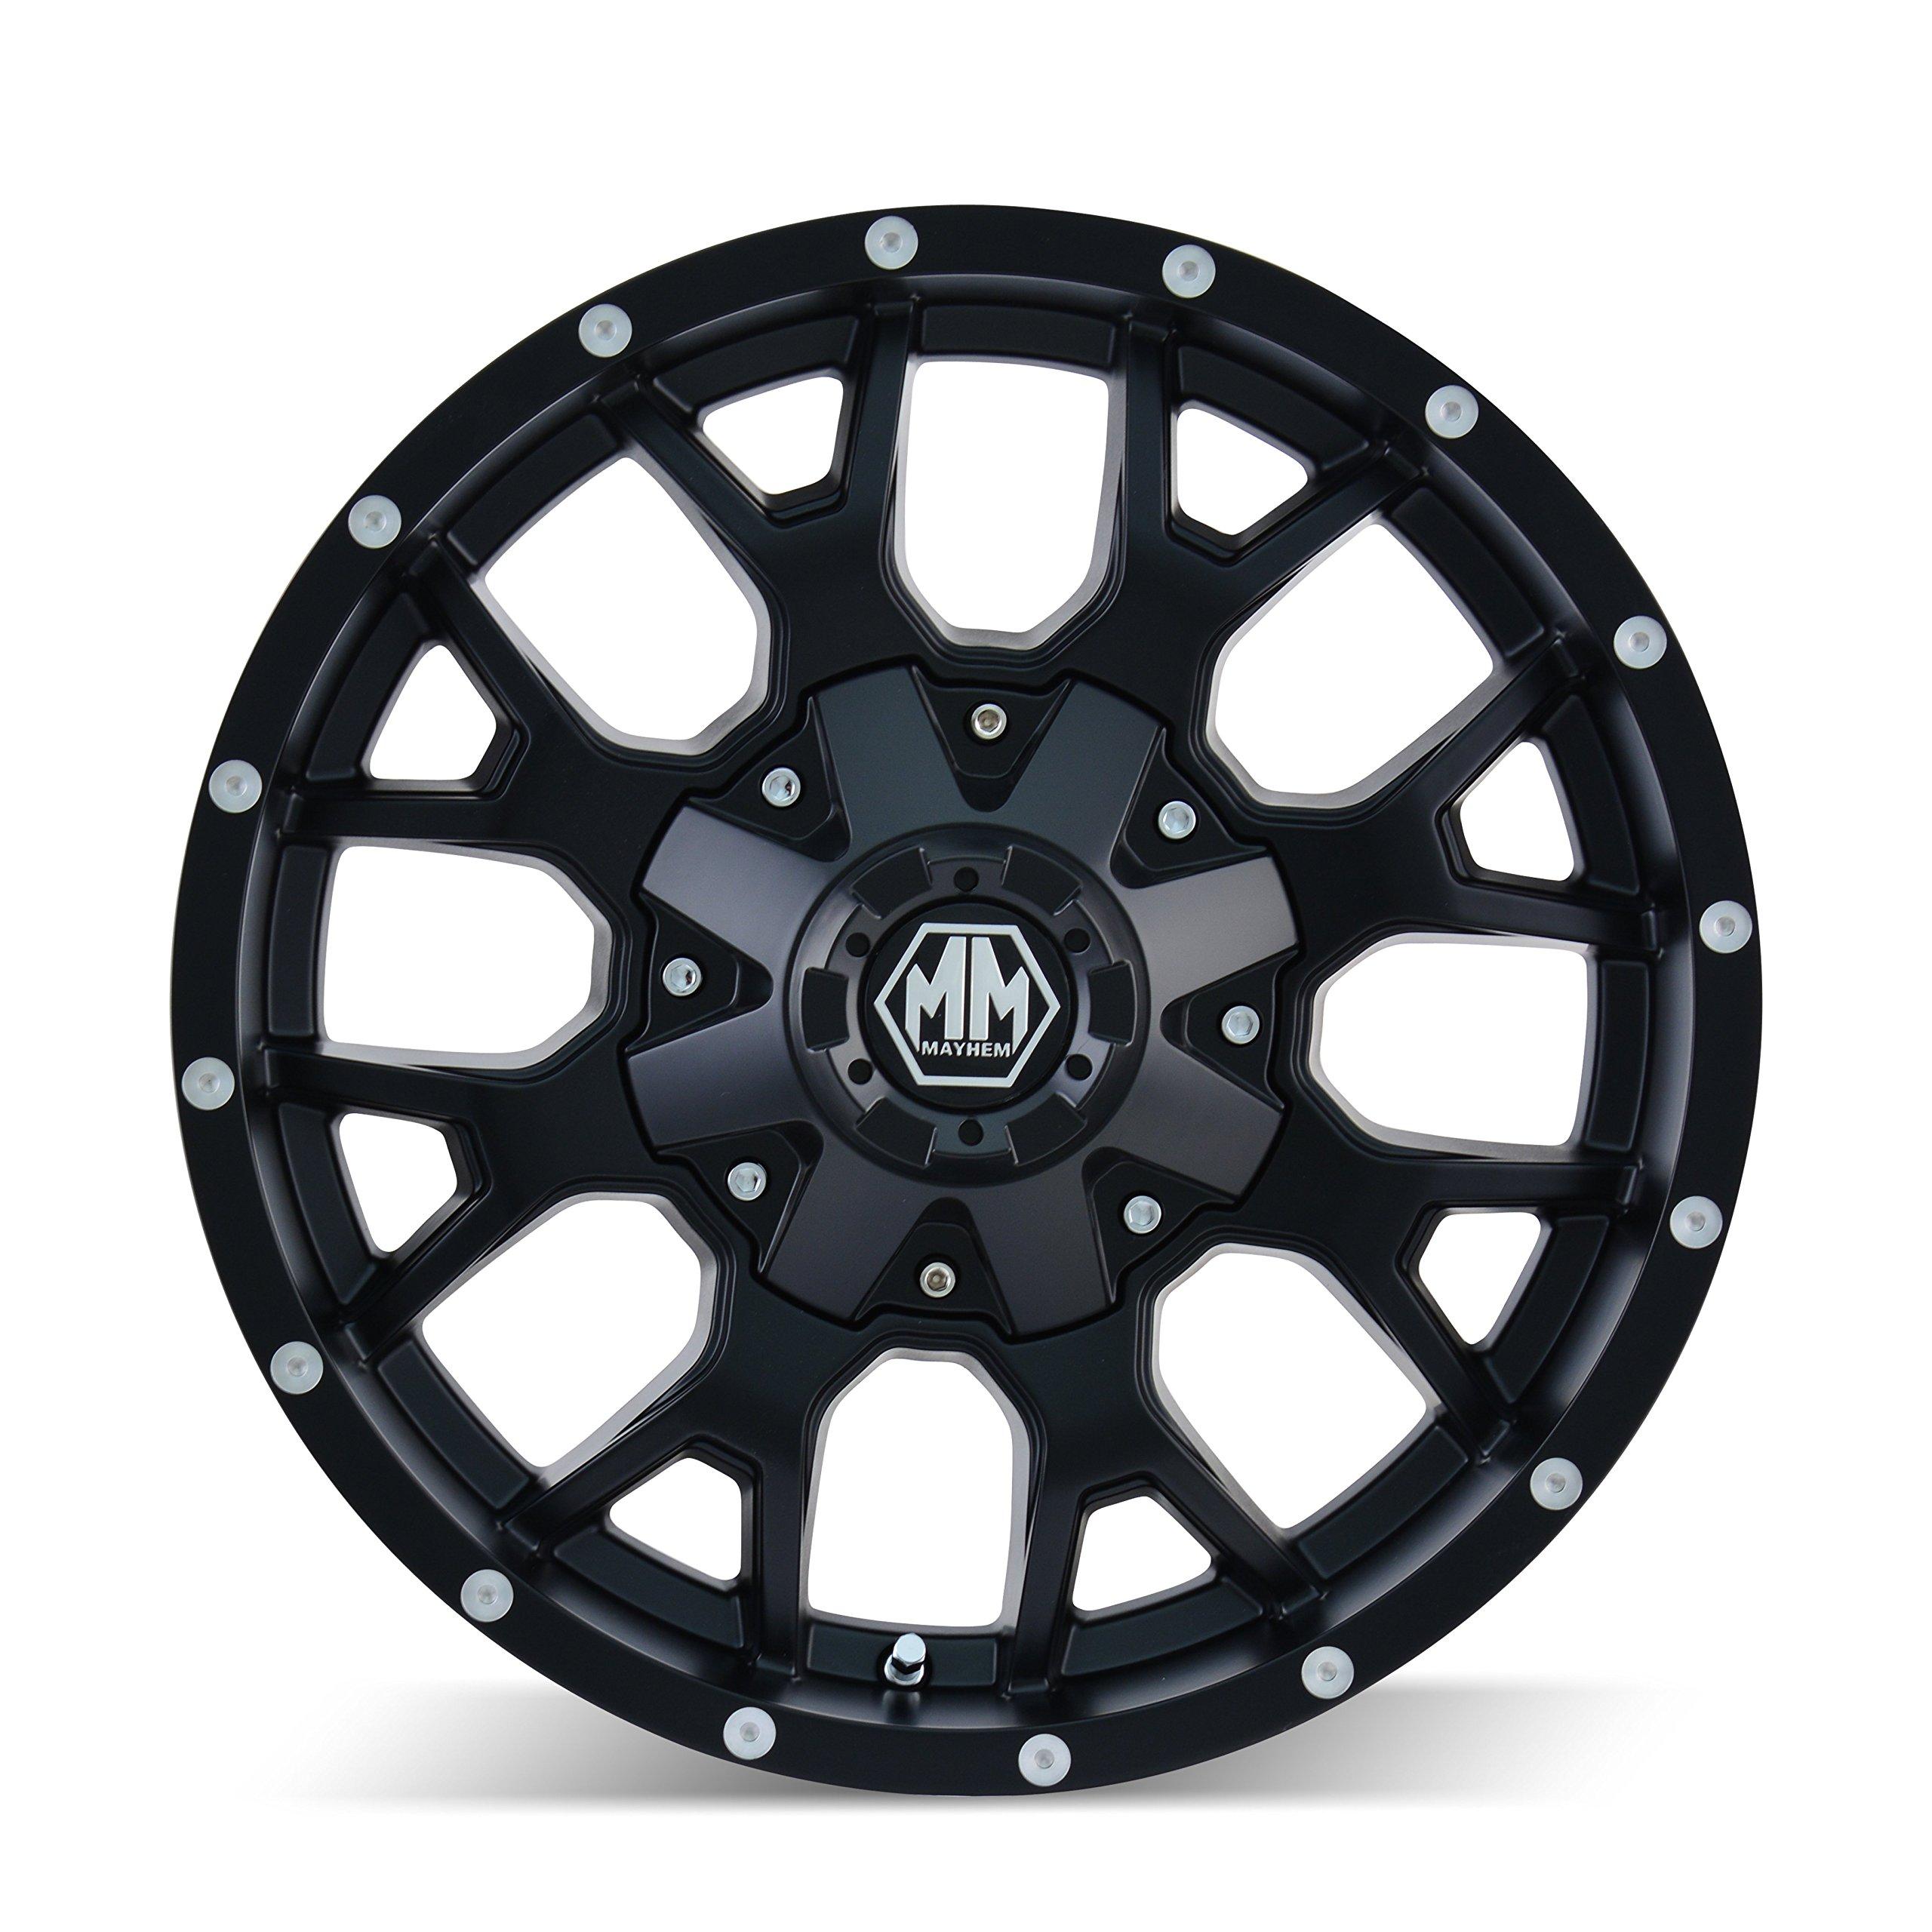 Mayhem Warrior 8015 Wheel with Matte Black Finish (18x9''/10x150mm)